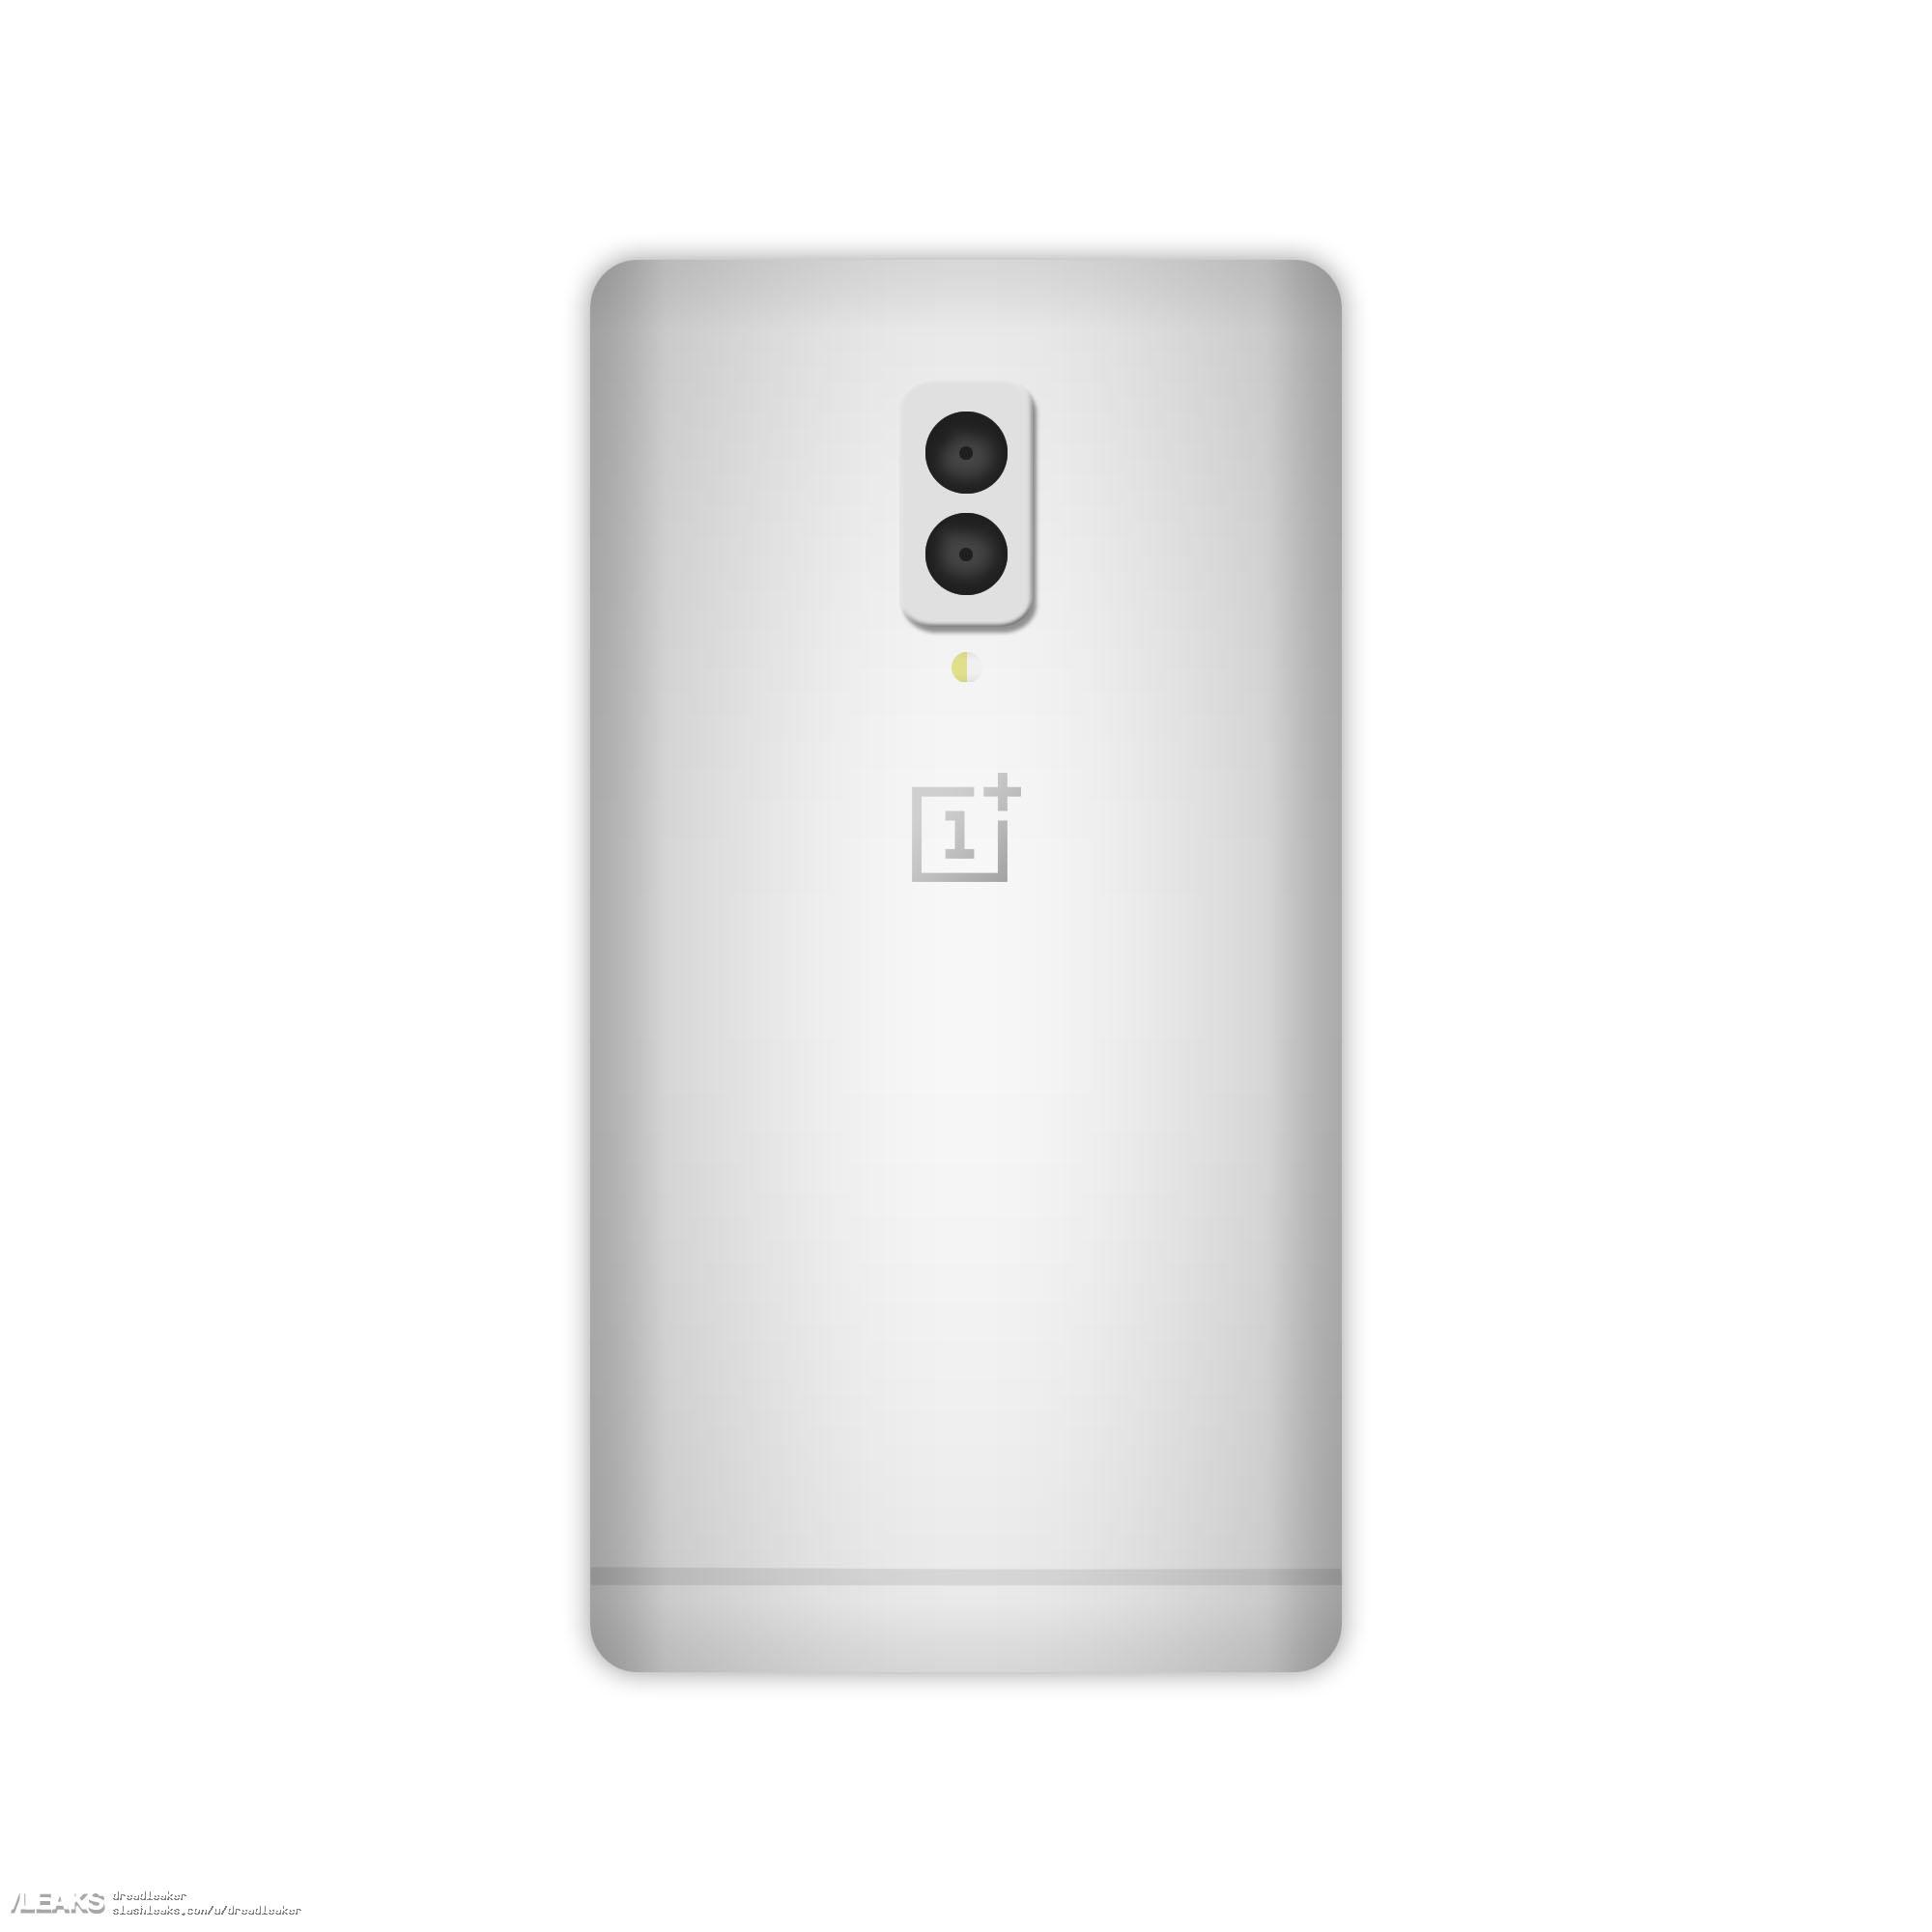 OnePlus 5 leaked image